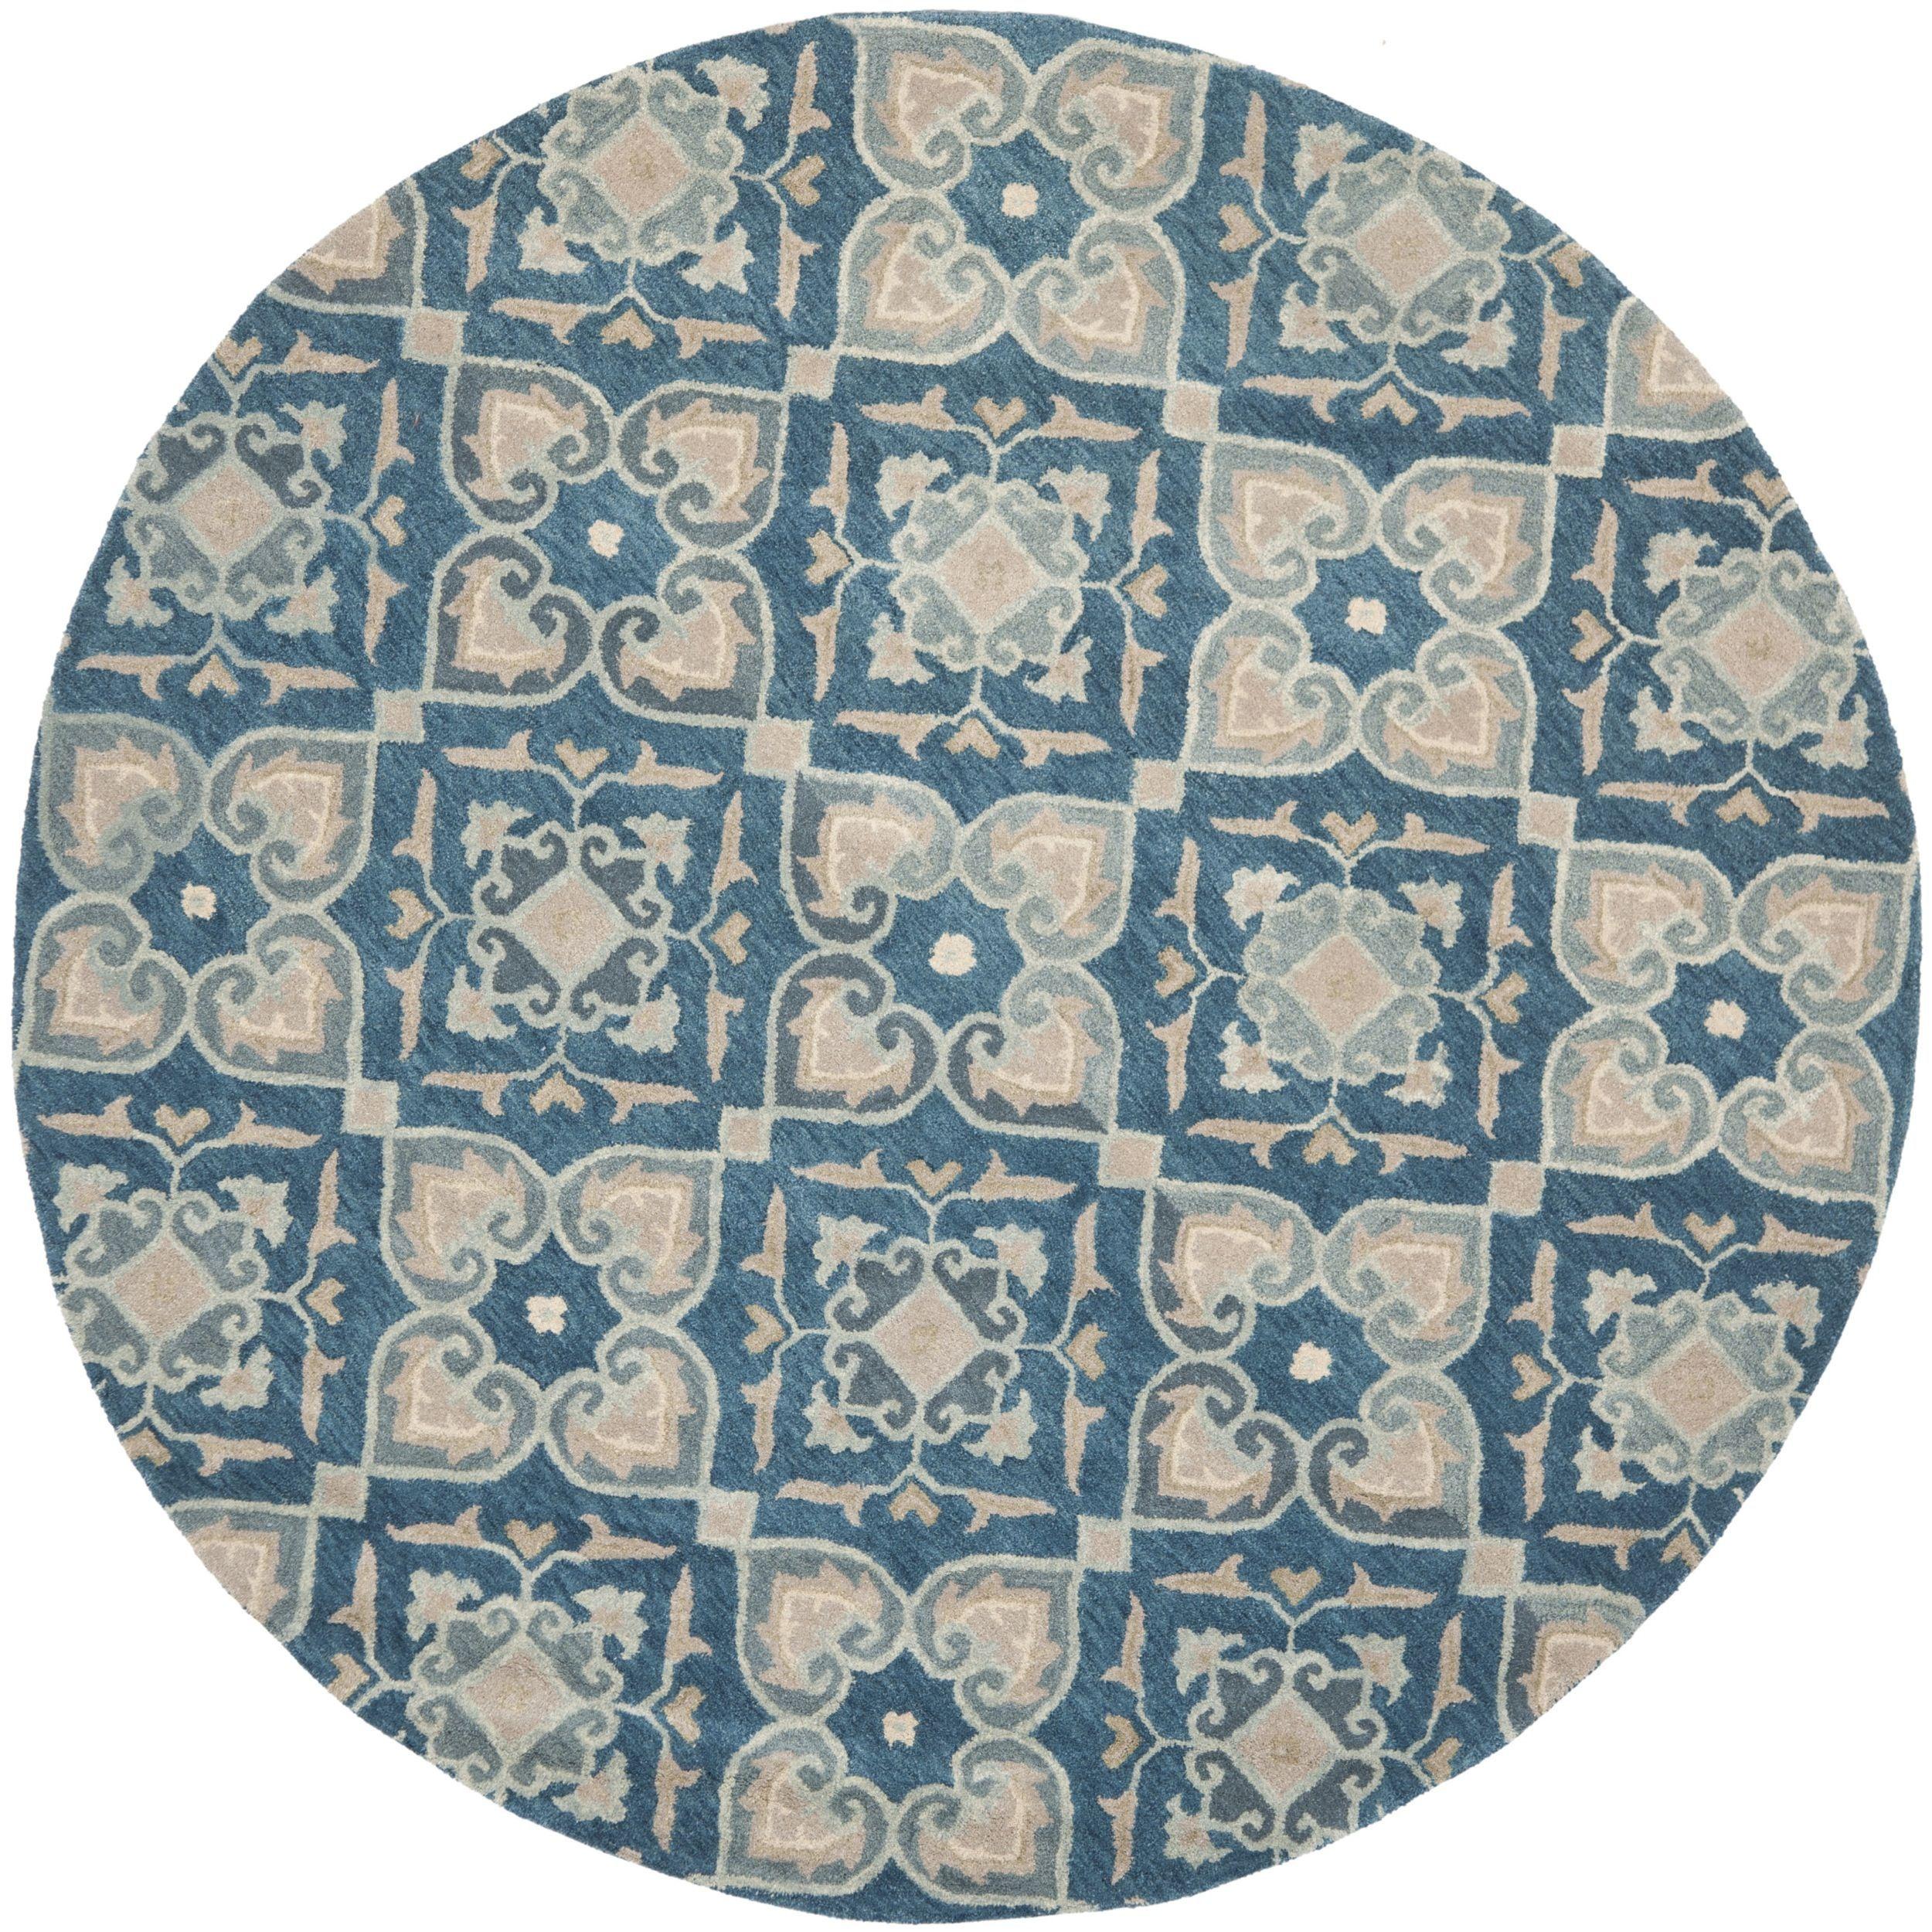 Safavieh Handmade Wyndham Blue New Zealand Wool Rug 7 X Round Ft Size Cotton Geometric